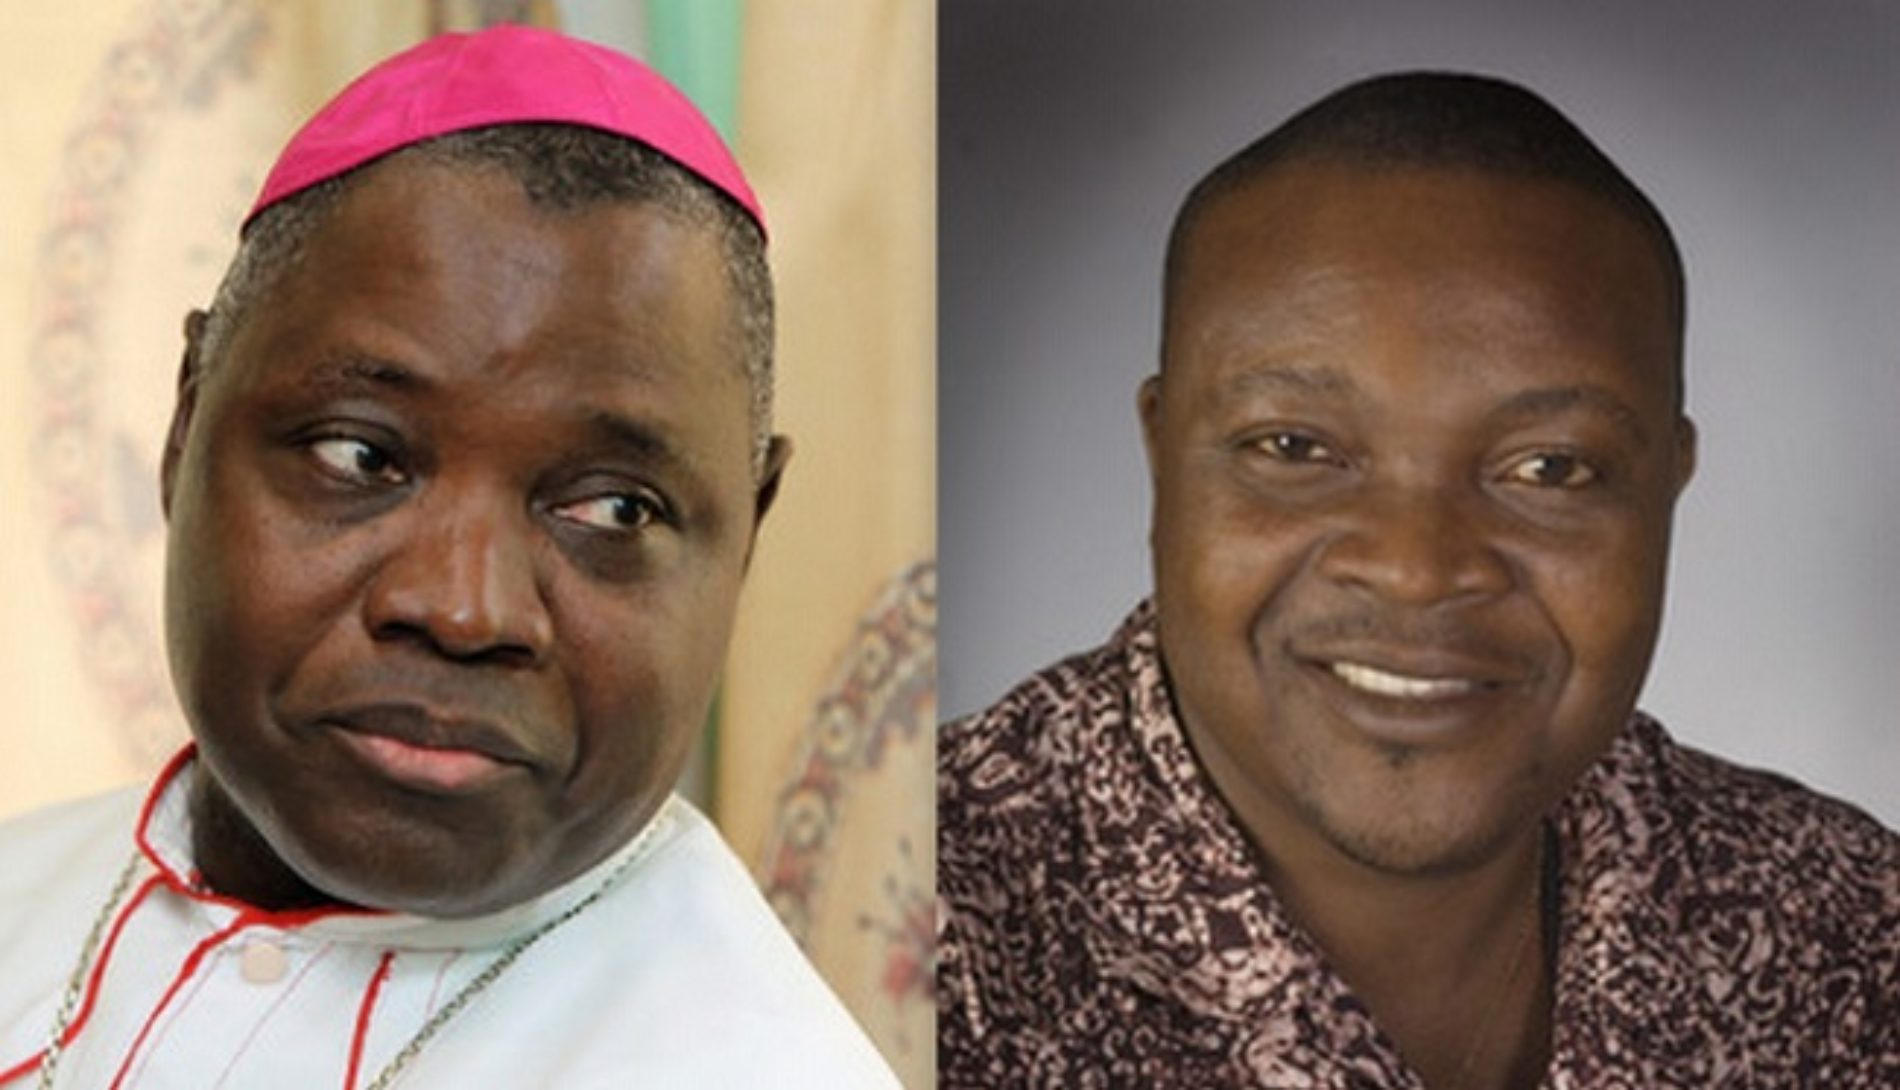 The LGBT response to Archbishop Kaigama's turnaround